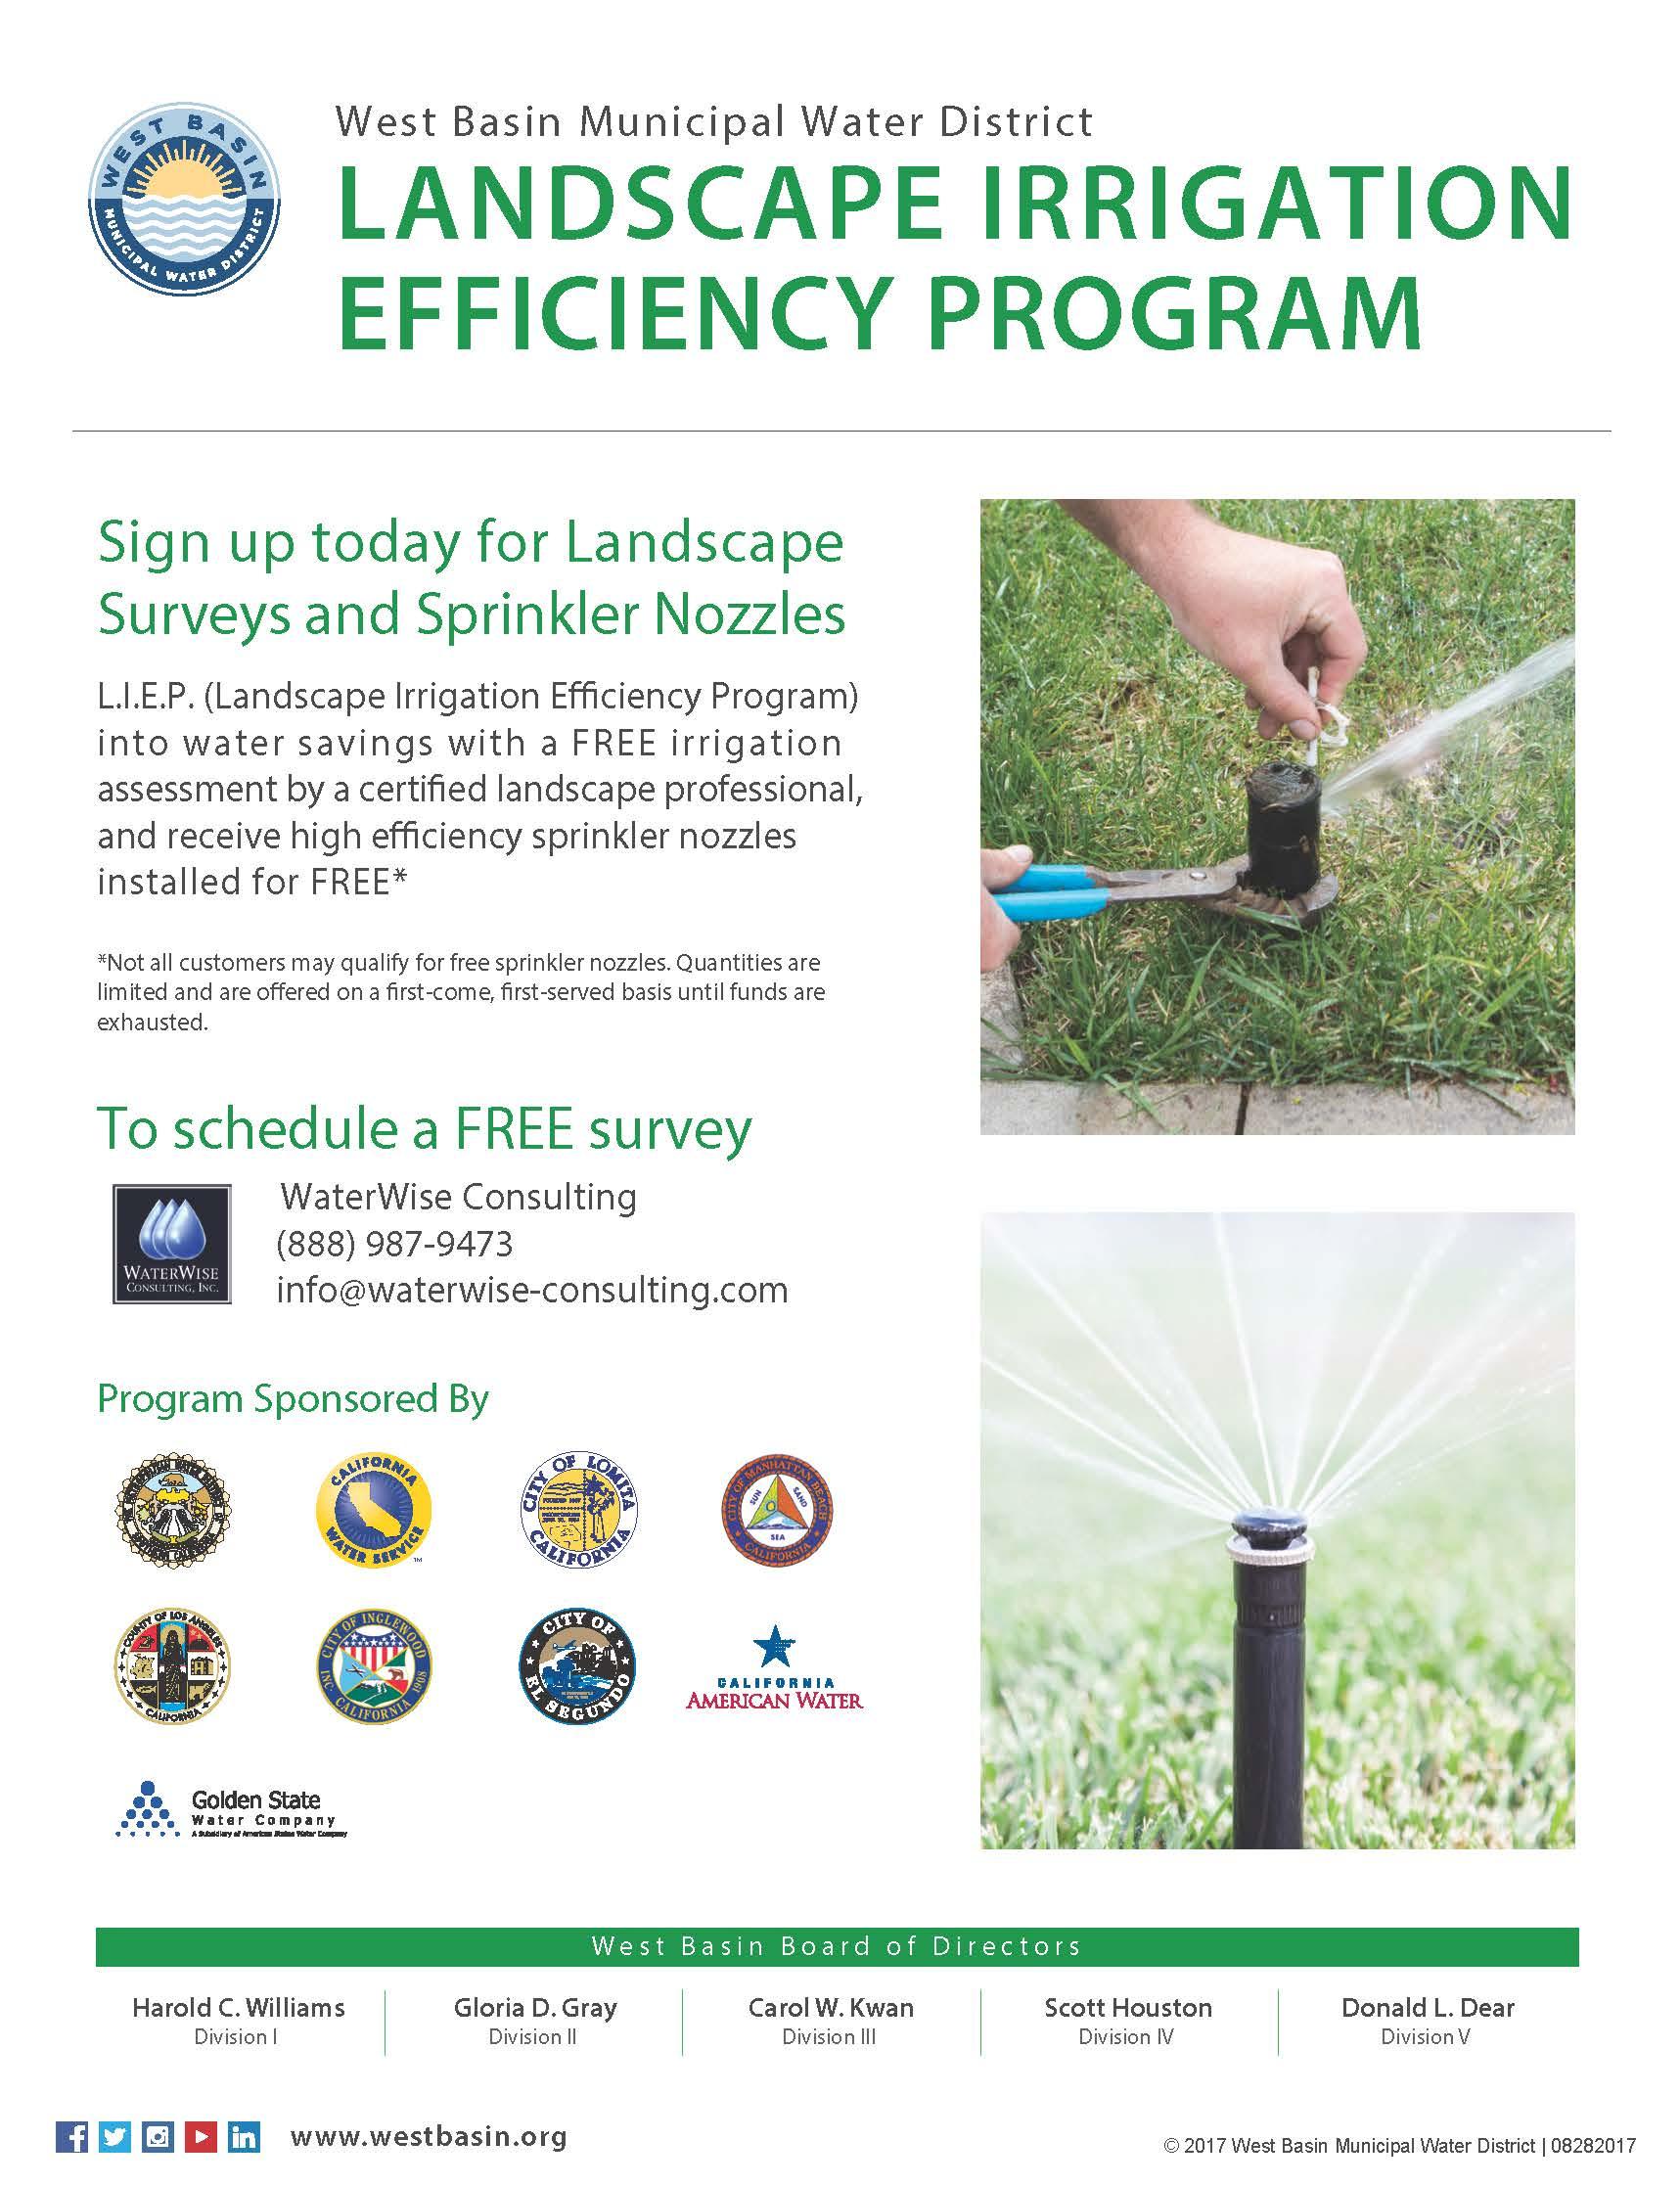 Landscape Irrigation Efficiency Program